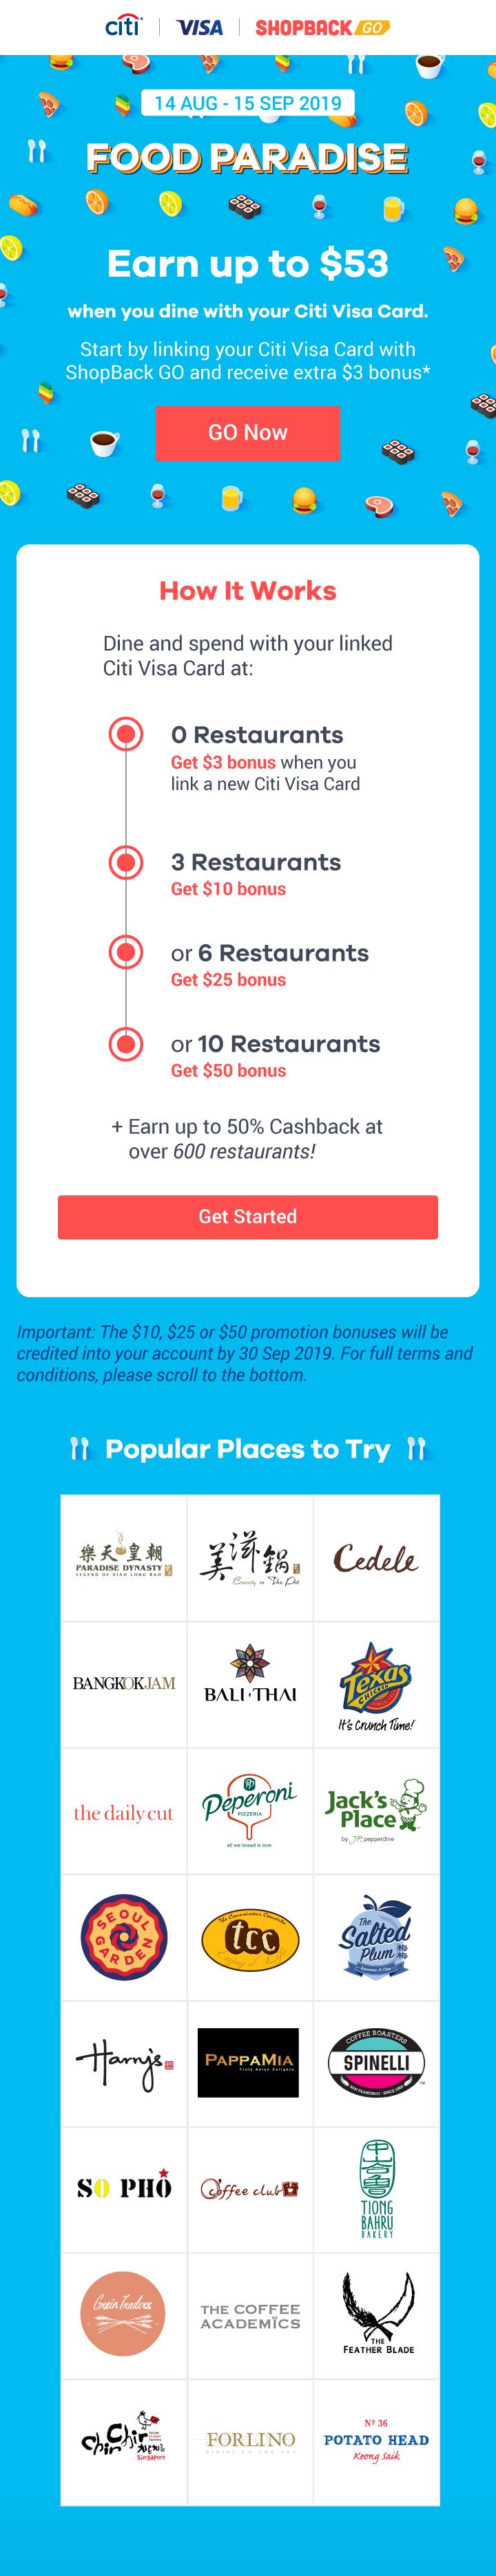 ShopBack GO - Citi Food Paradise